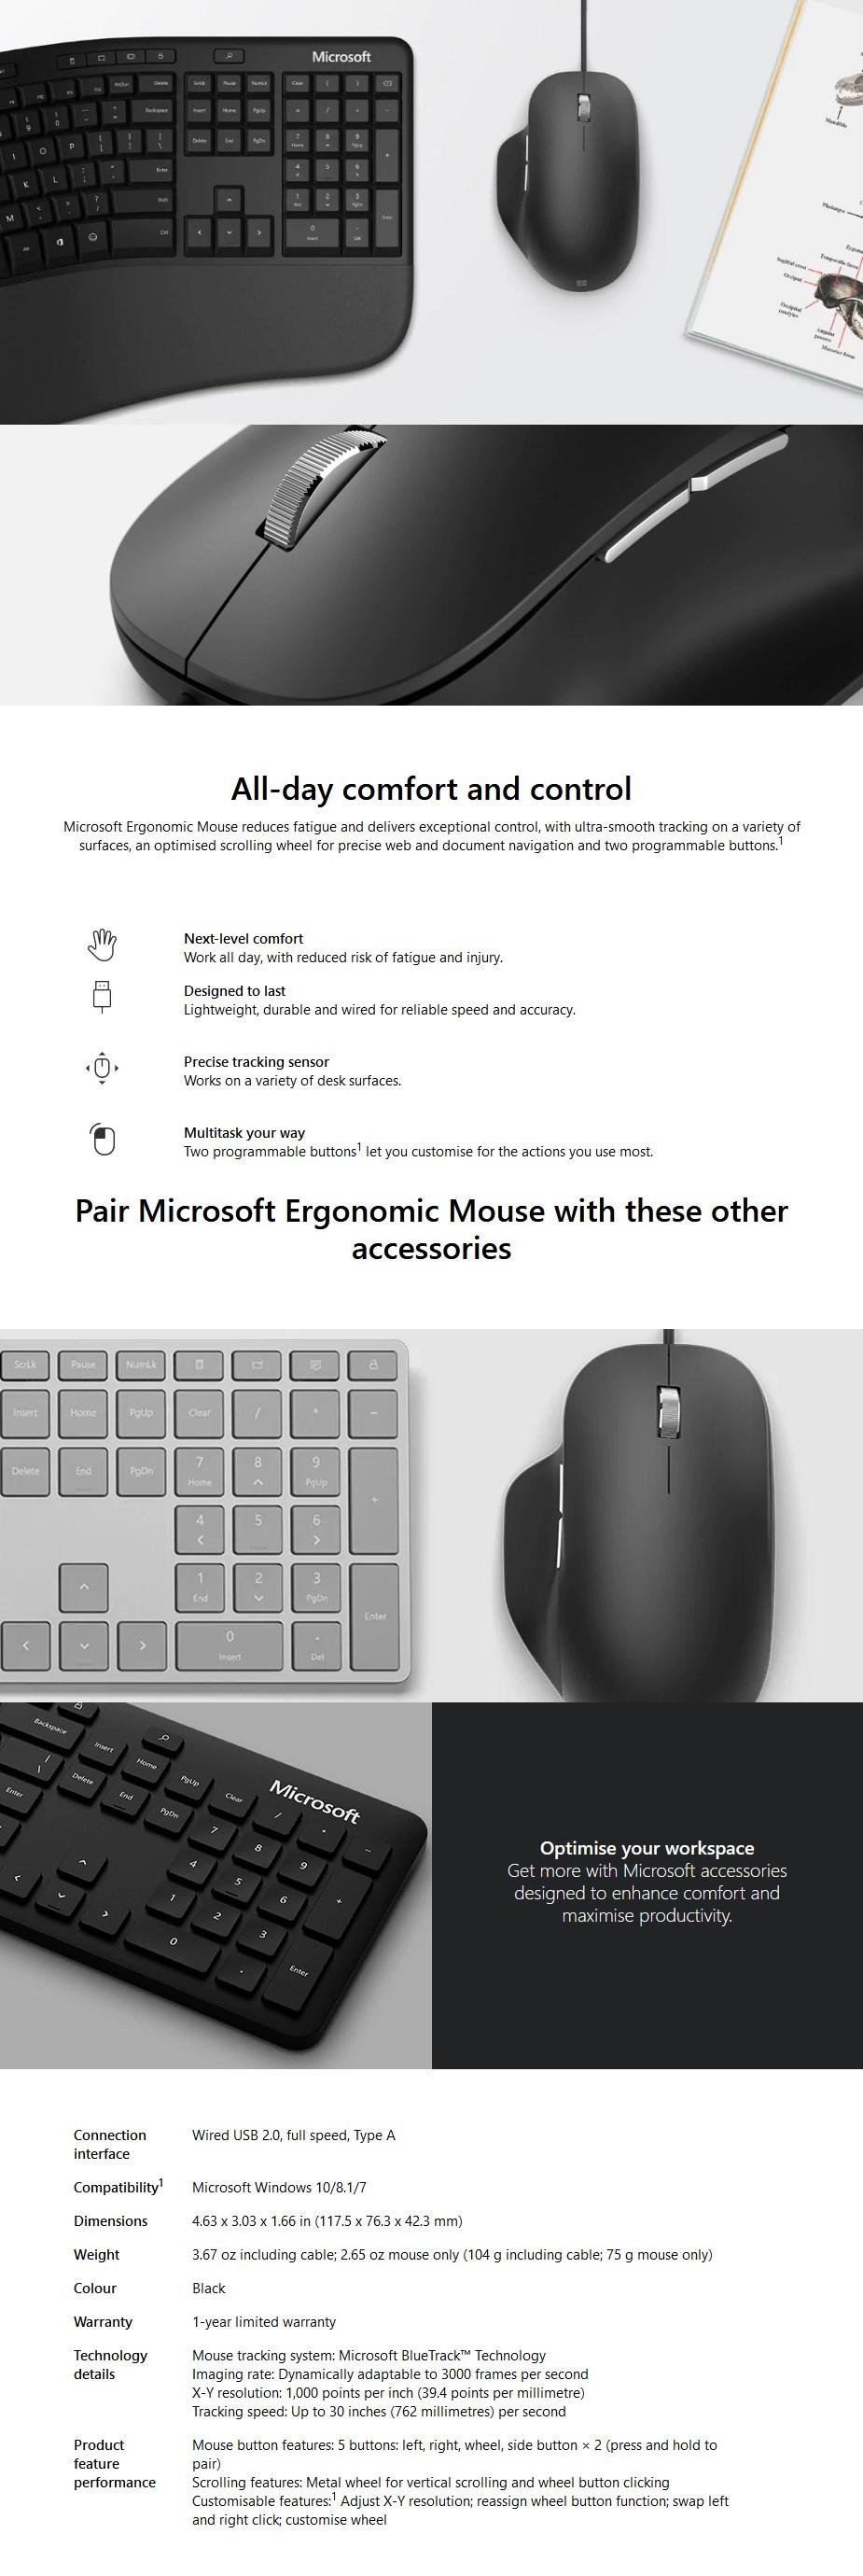 Microsoft Ergonomic Laser Mouse - Black - Overview 1